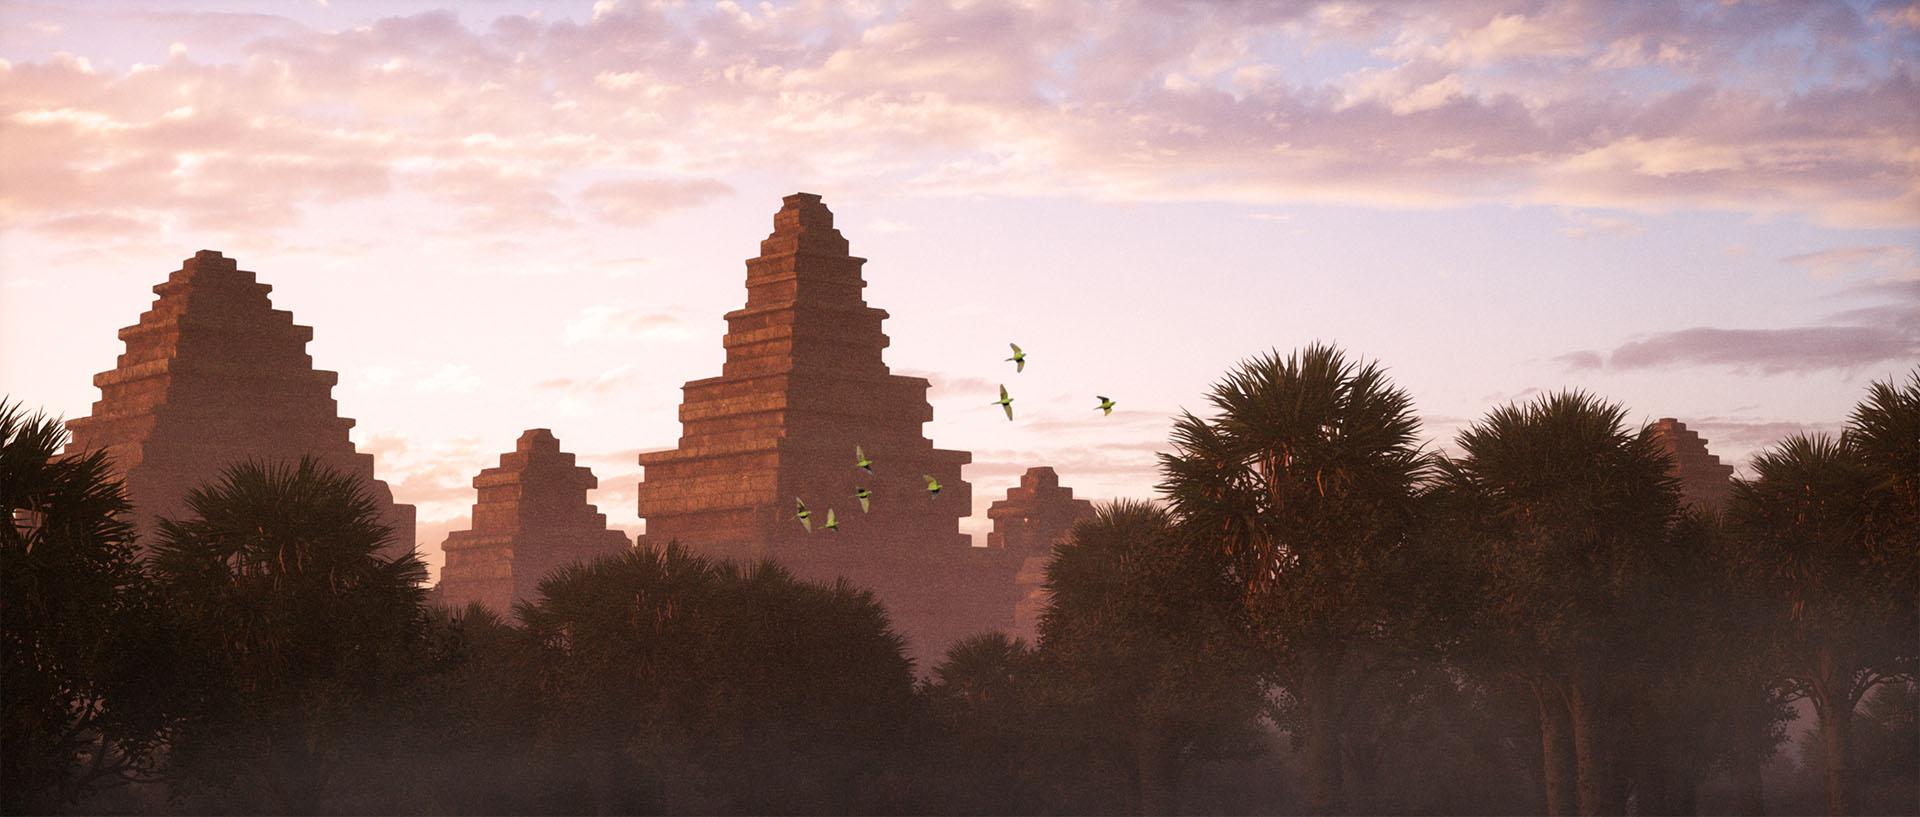 190107 Jungle_Temple_Dawn1.jpg